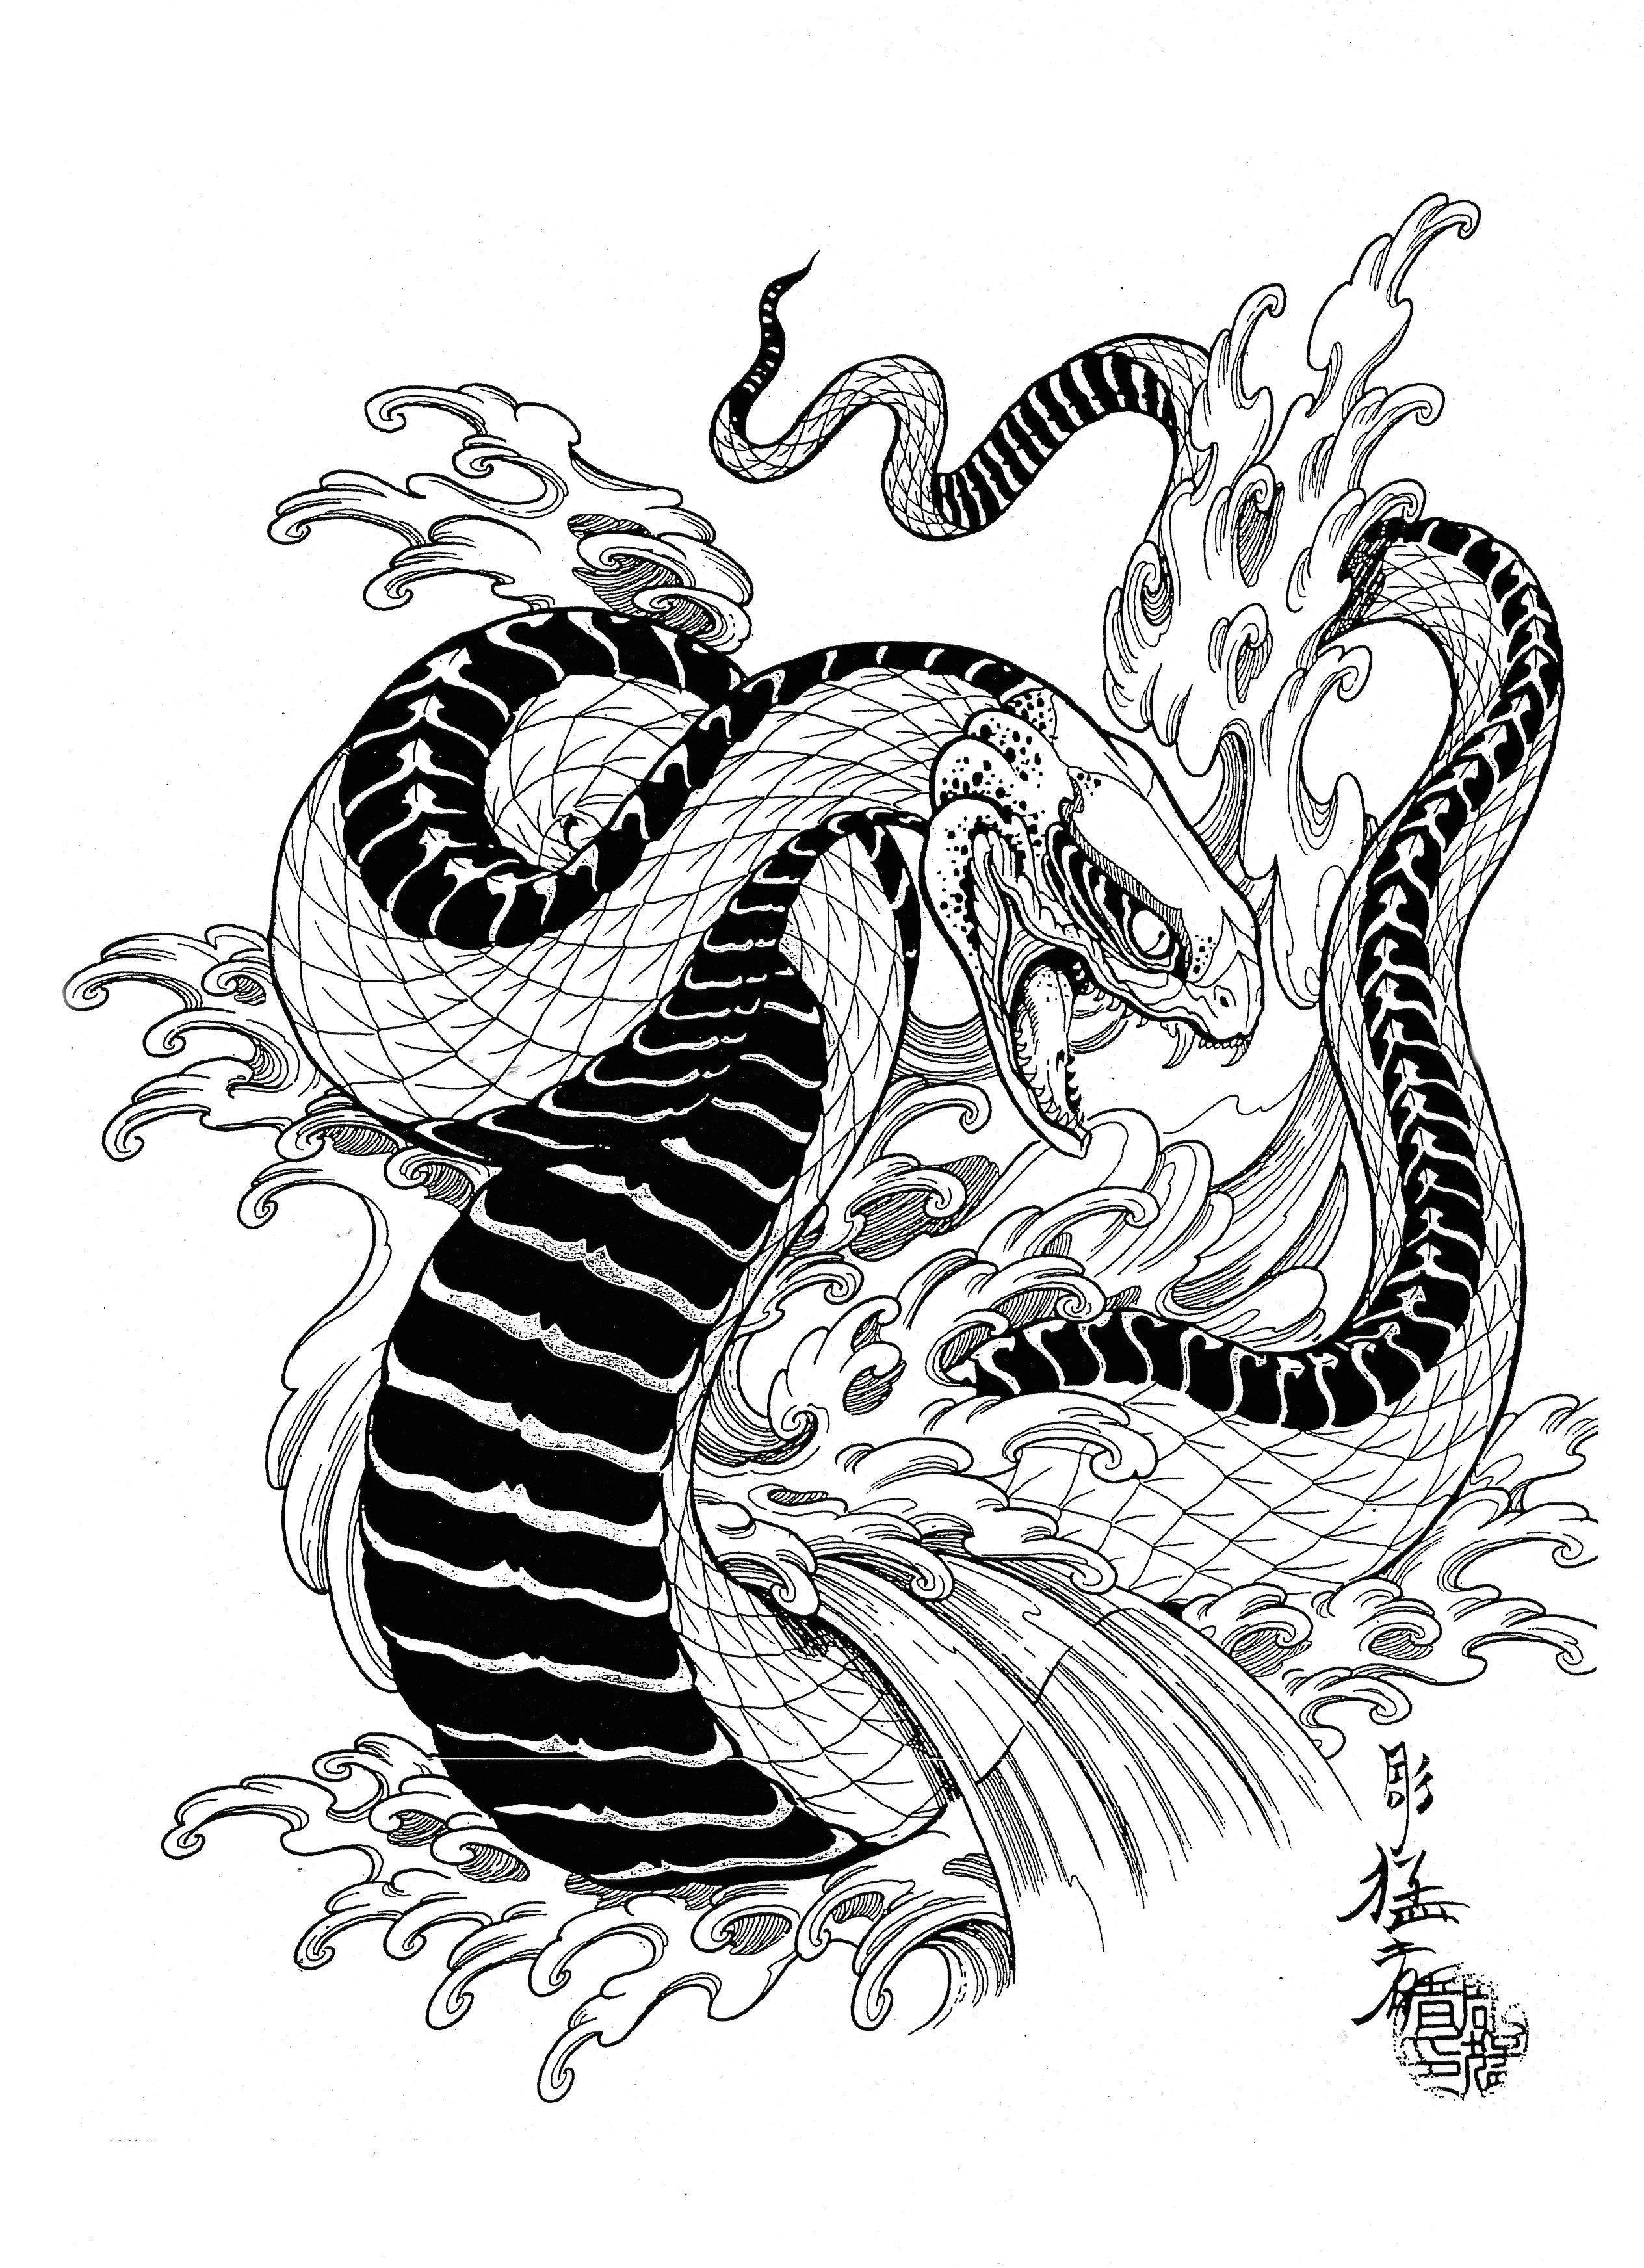 jack mosher tattoo flash set 100 art pinterest tattoos snake tattoo and. Black Bedroom Furniture Sets. Home Design Ideas